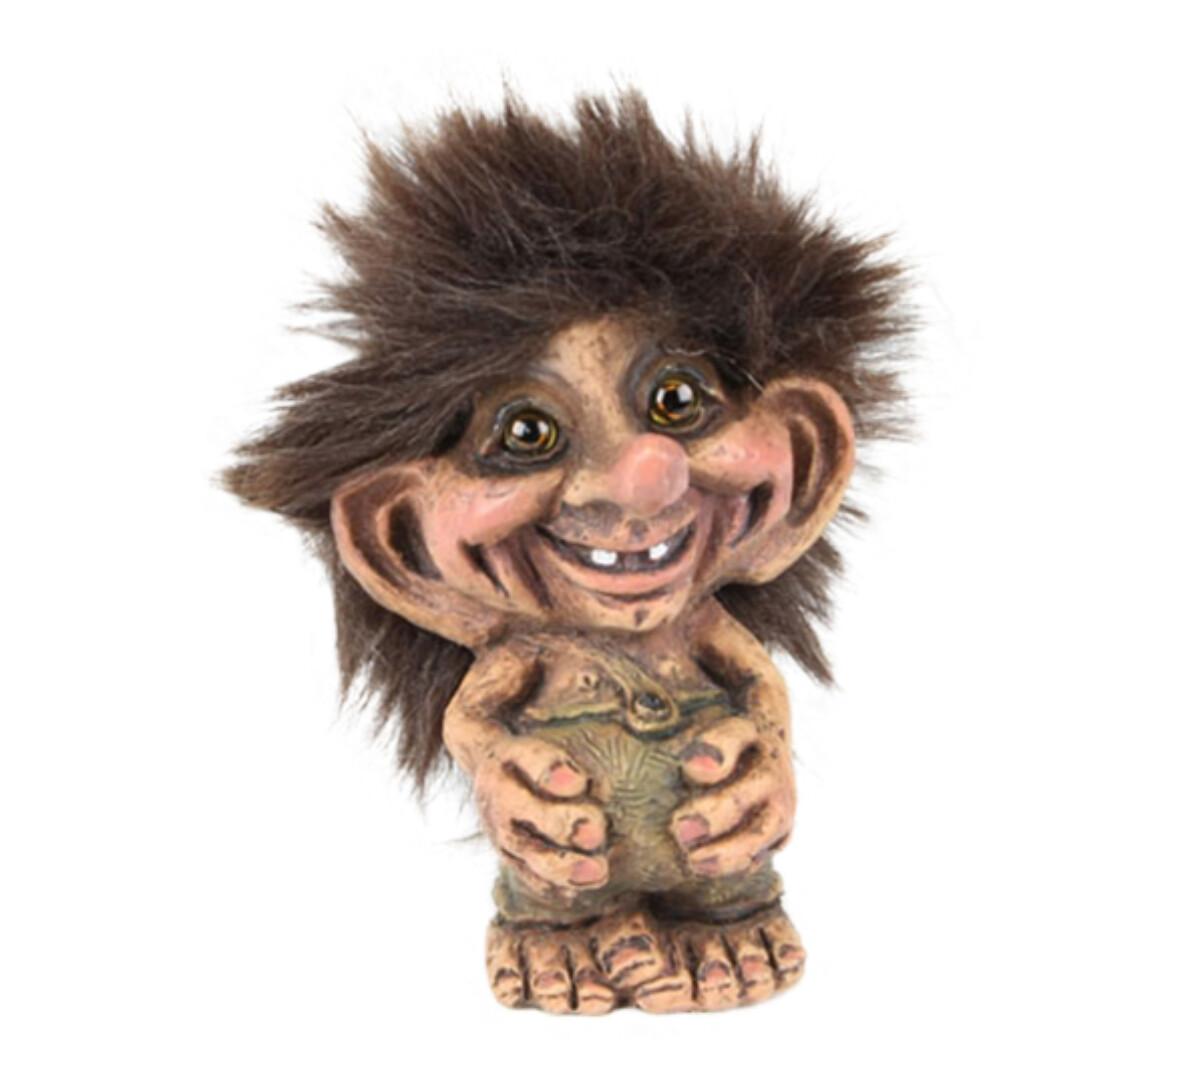 Troll boy with long nose (Troll # 060)